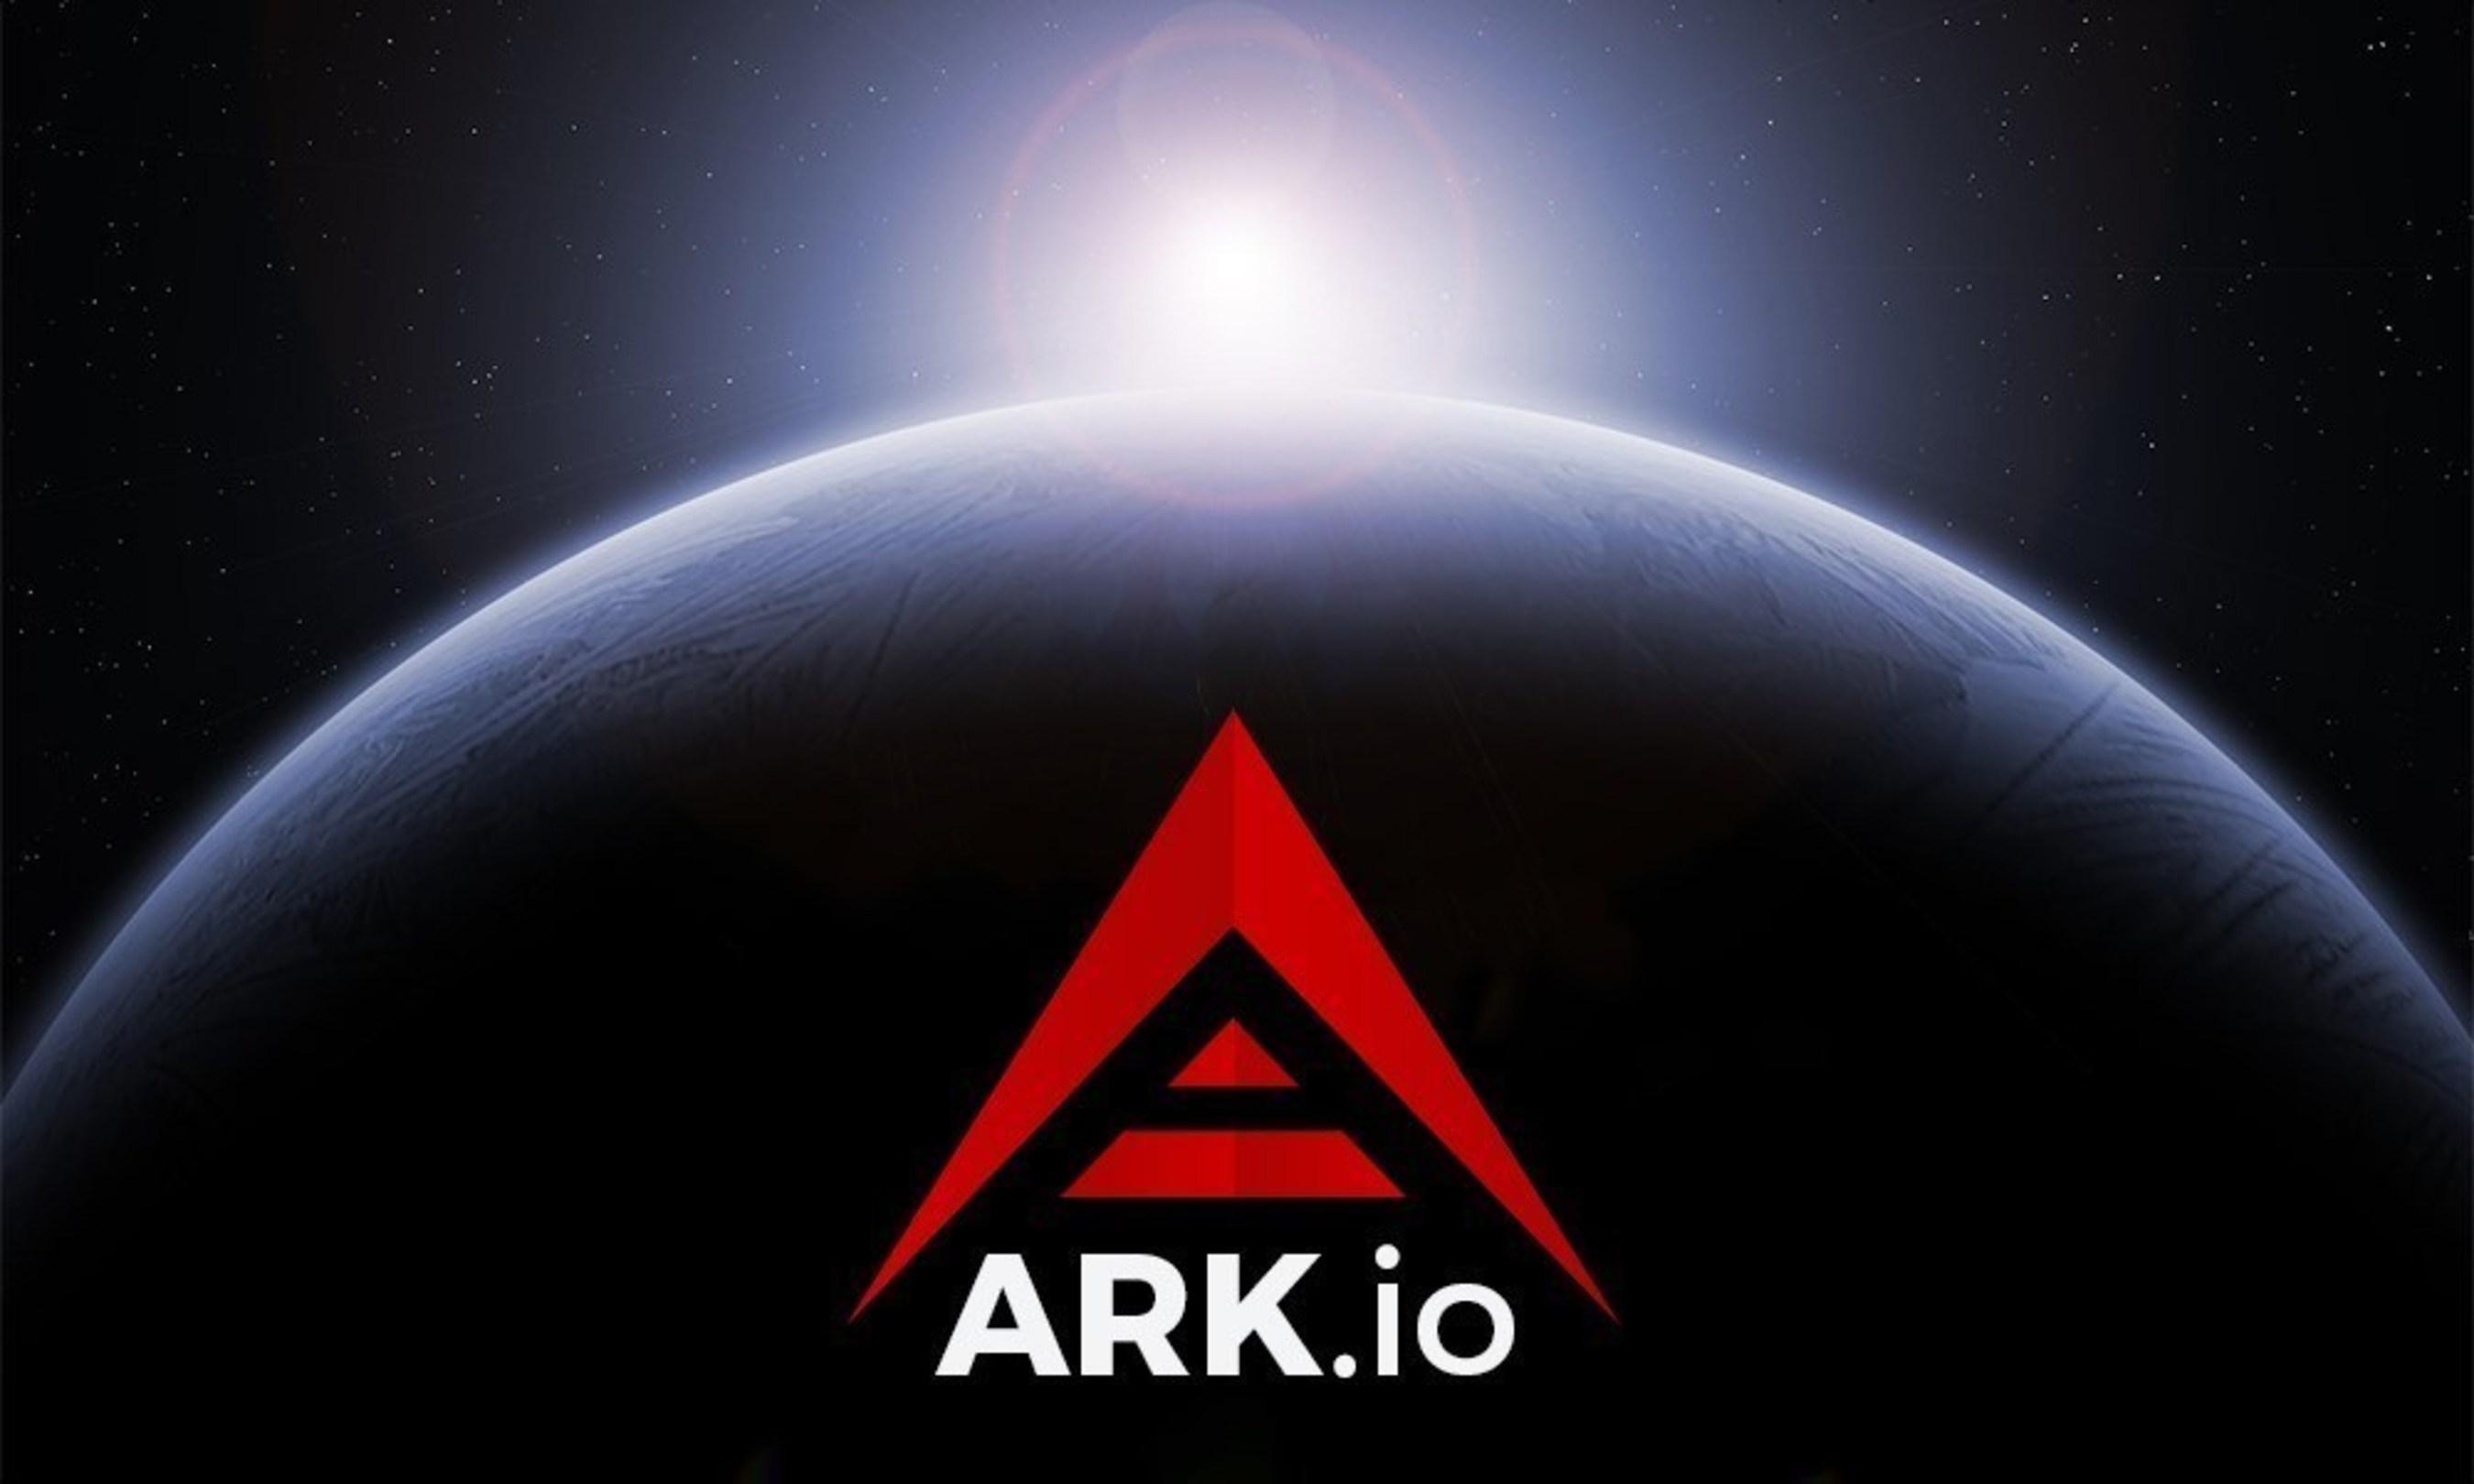 ARK Crew Announces Official Open Source Release of ARK Blockchain Code on GitHub